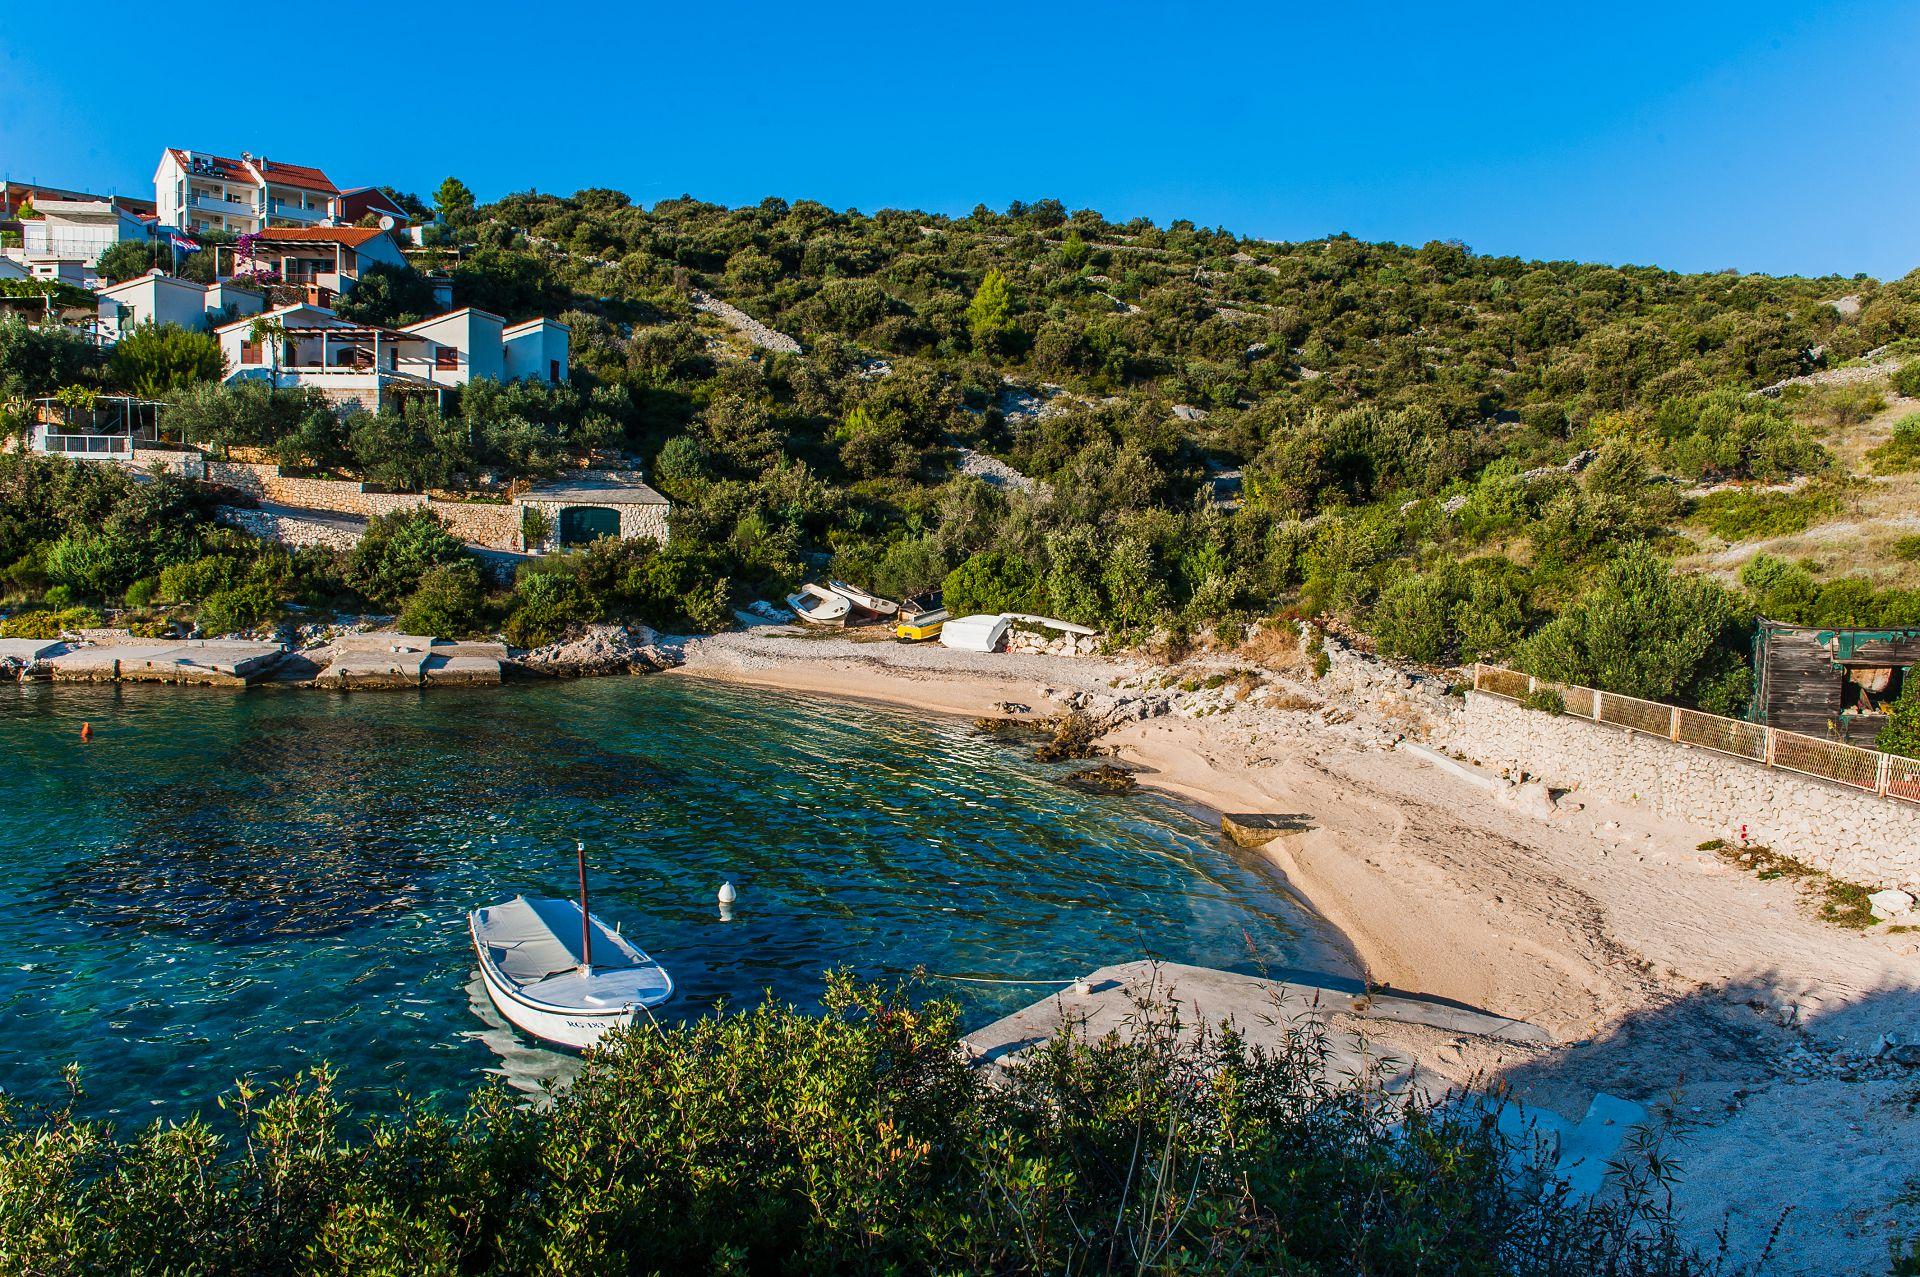 Ferienwohnung 01106ROGO A2(6+2) - Bucht Kanica (Rogoznica) (741933), Rogoznica, , Dalmatien, Kroatien, Bild 6